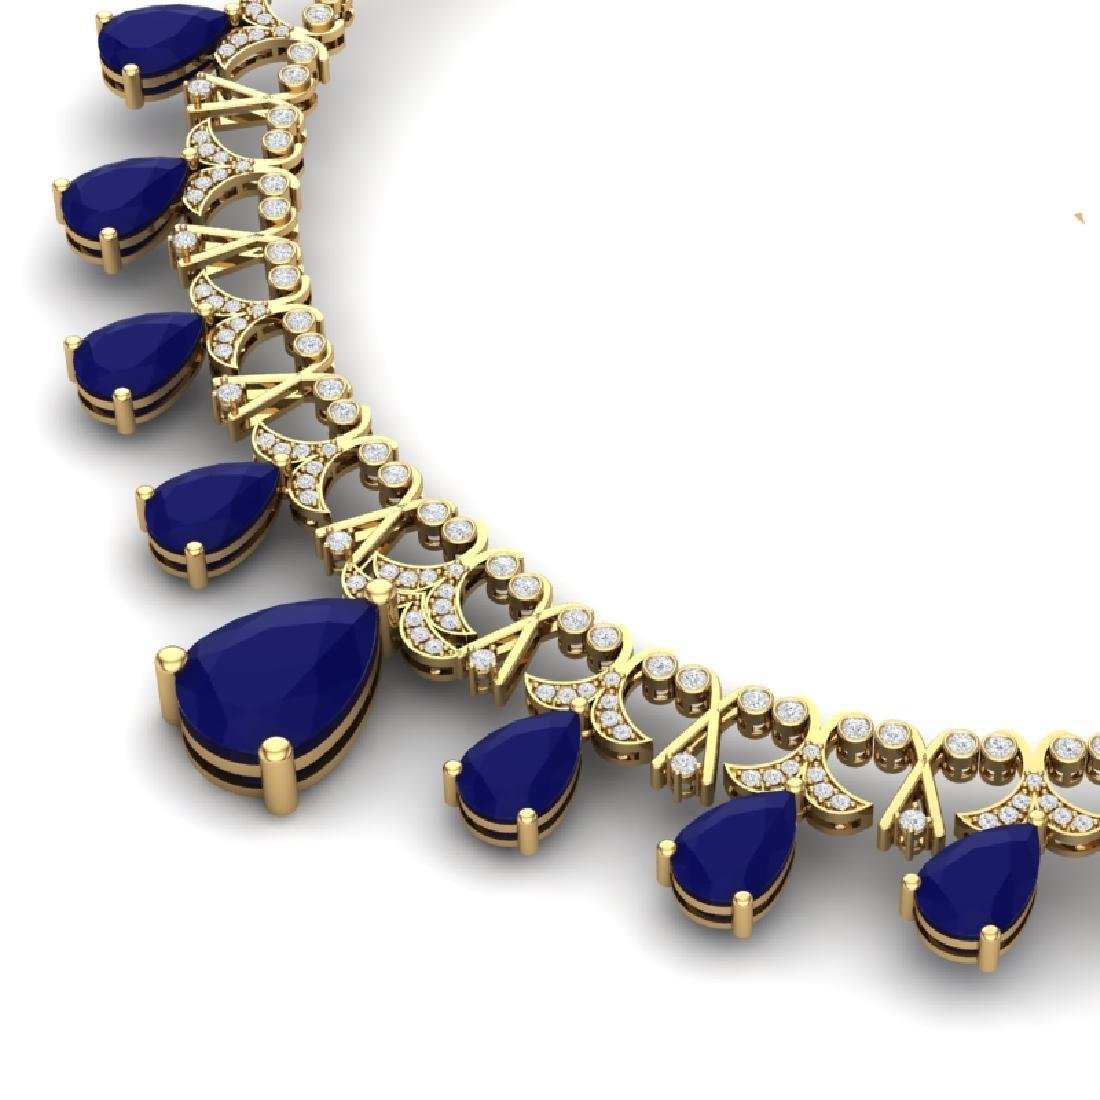 56.94 CTW Royalty Sapphire & VS Diamond Necklace 18K - 2